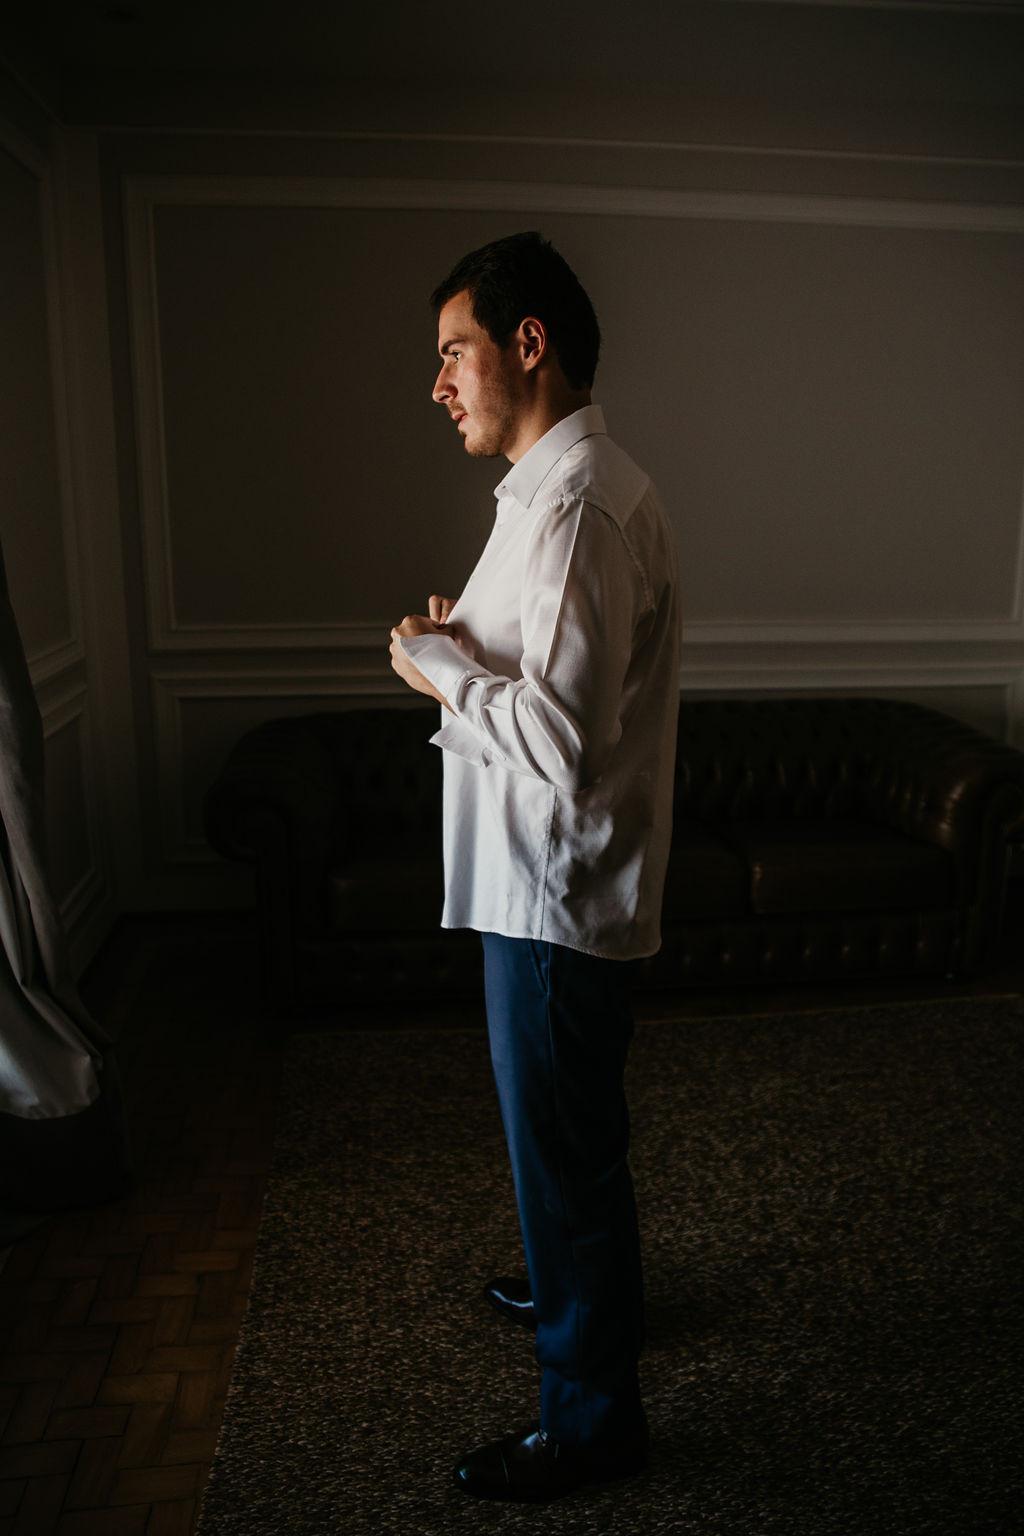 Casamento Maison Granville - Making Of Noivo